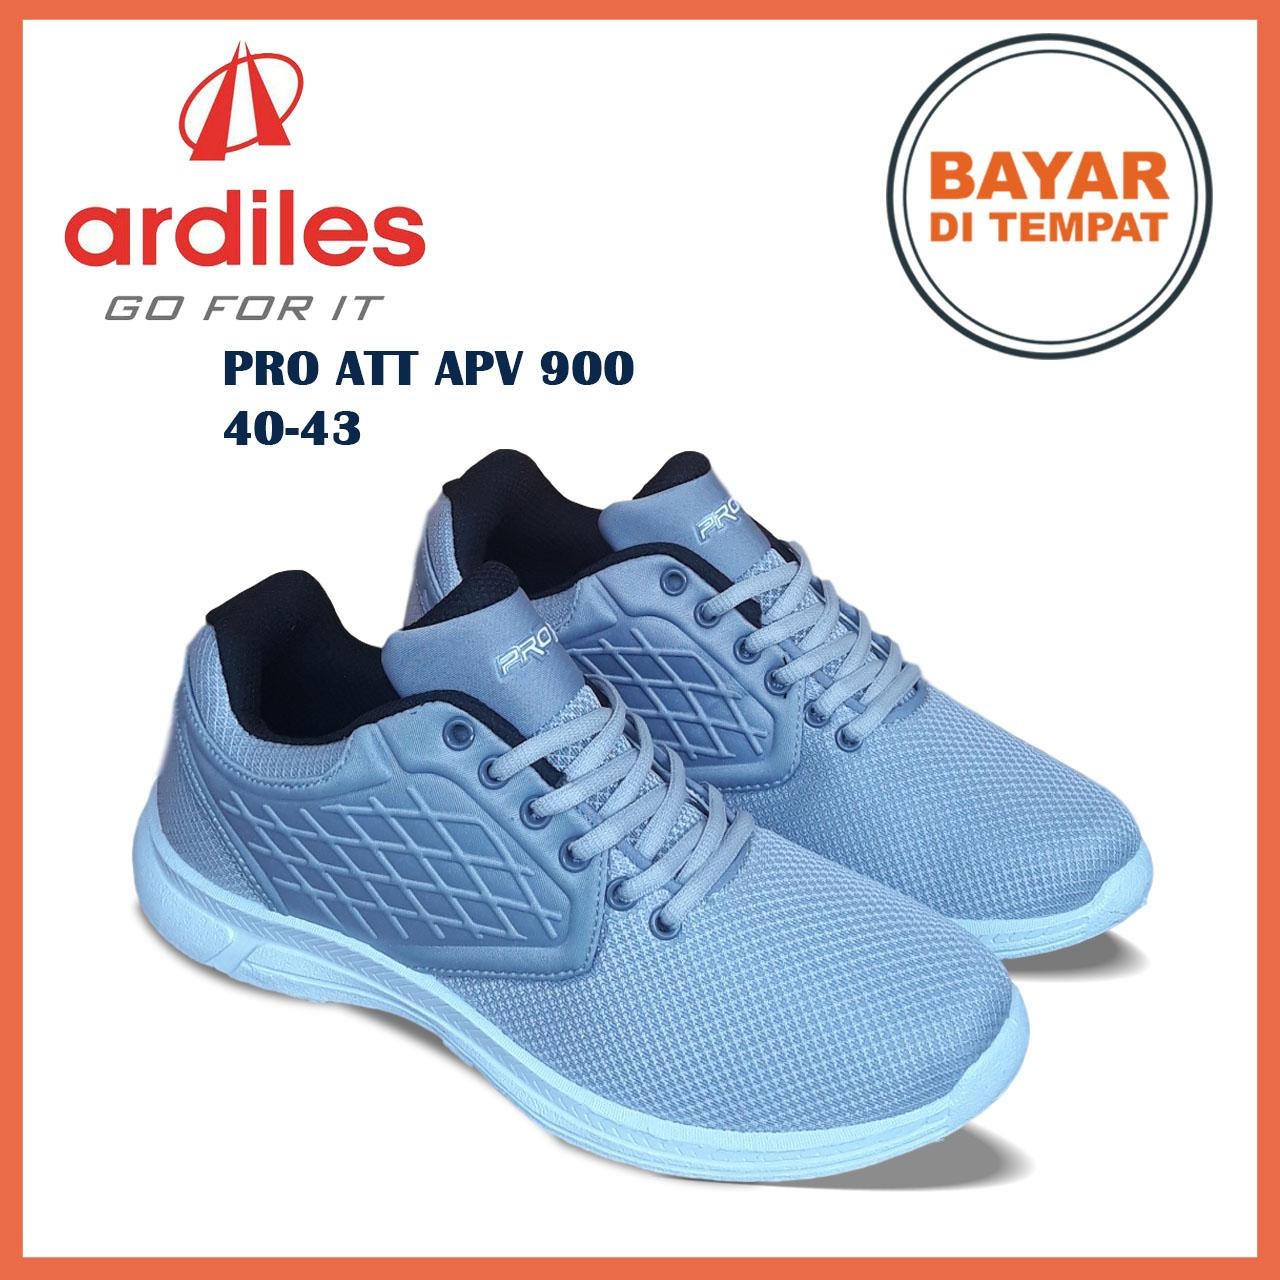 Amelia Olshop Sepatu Pro Att Sneaker Pria High Quality New Arrival ... ee0d312b9a